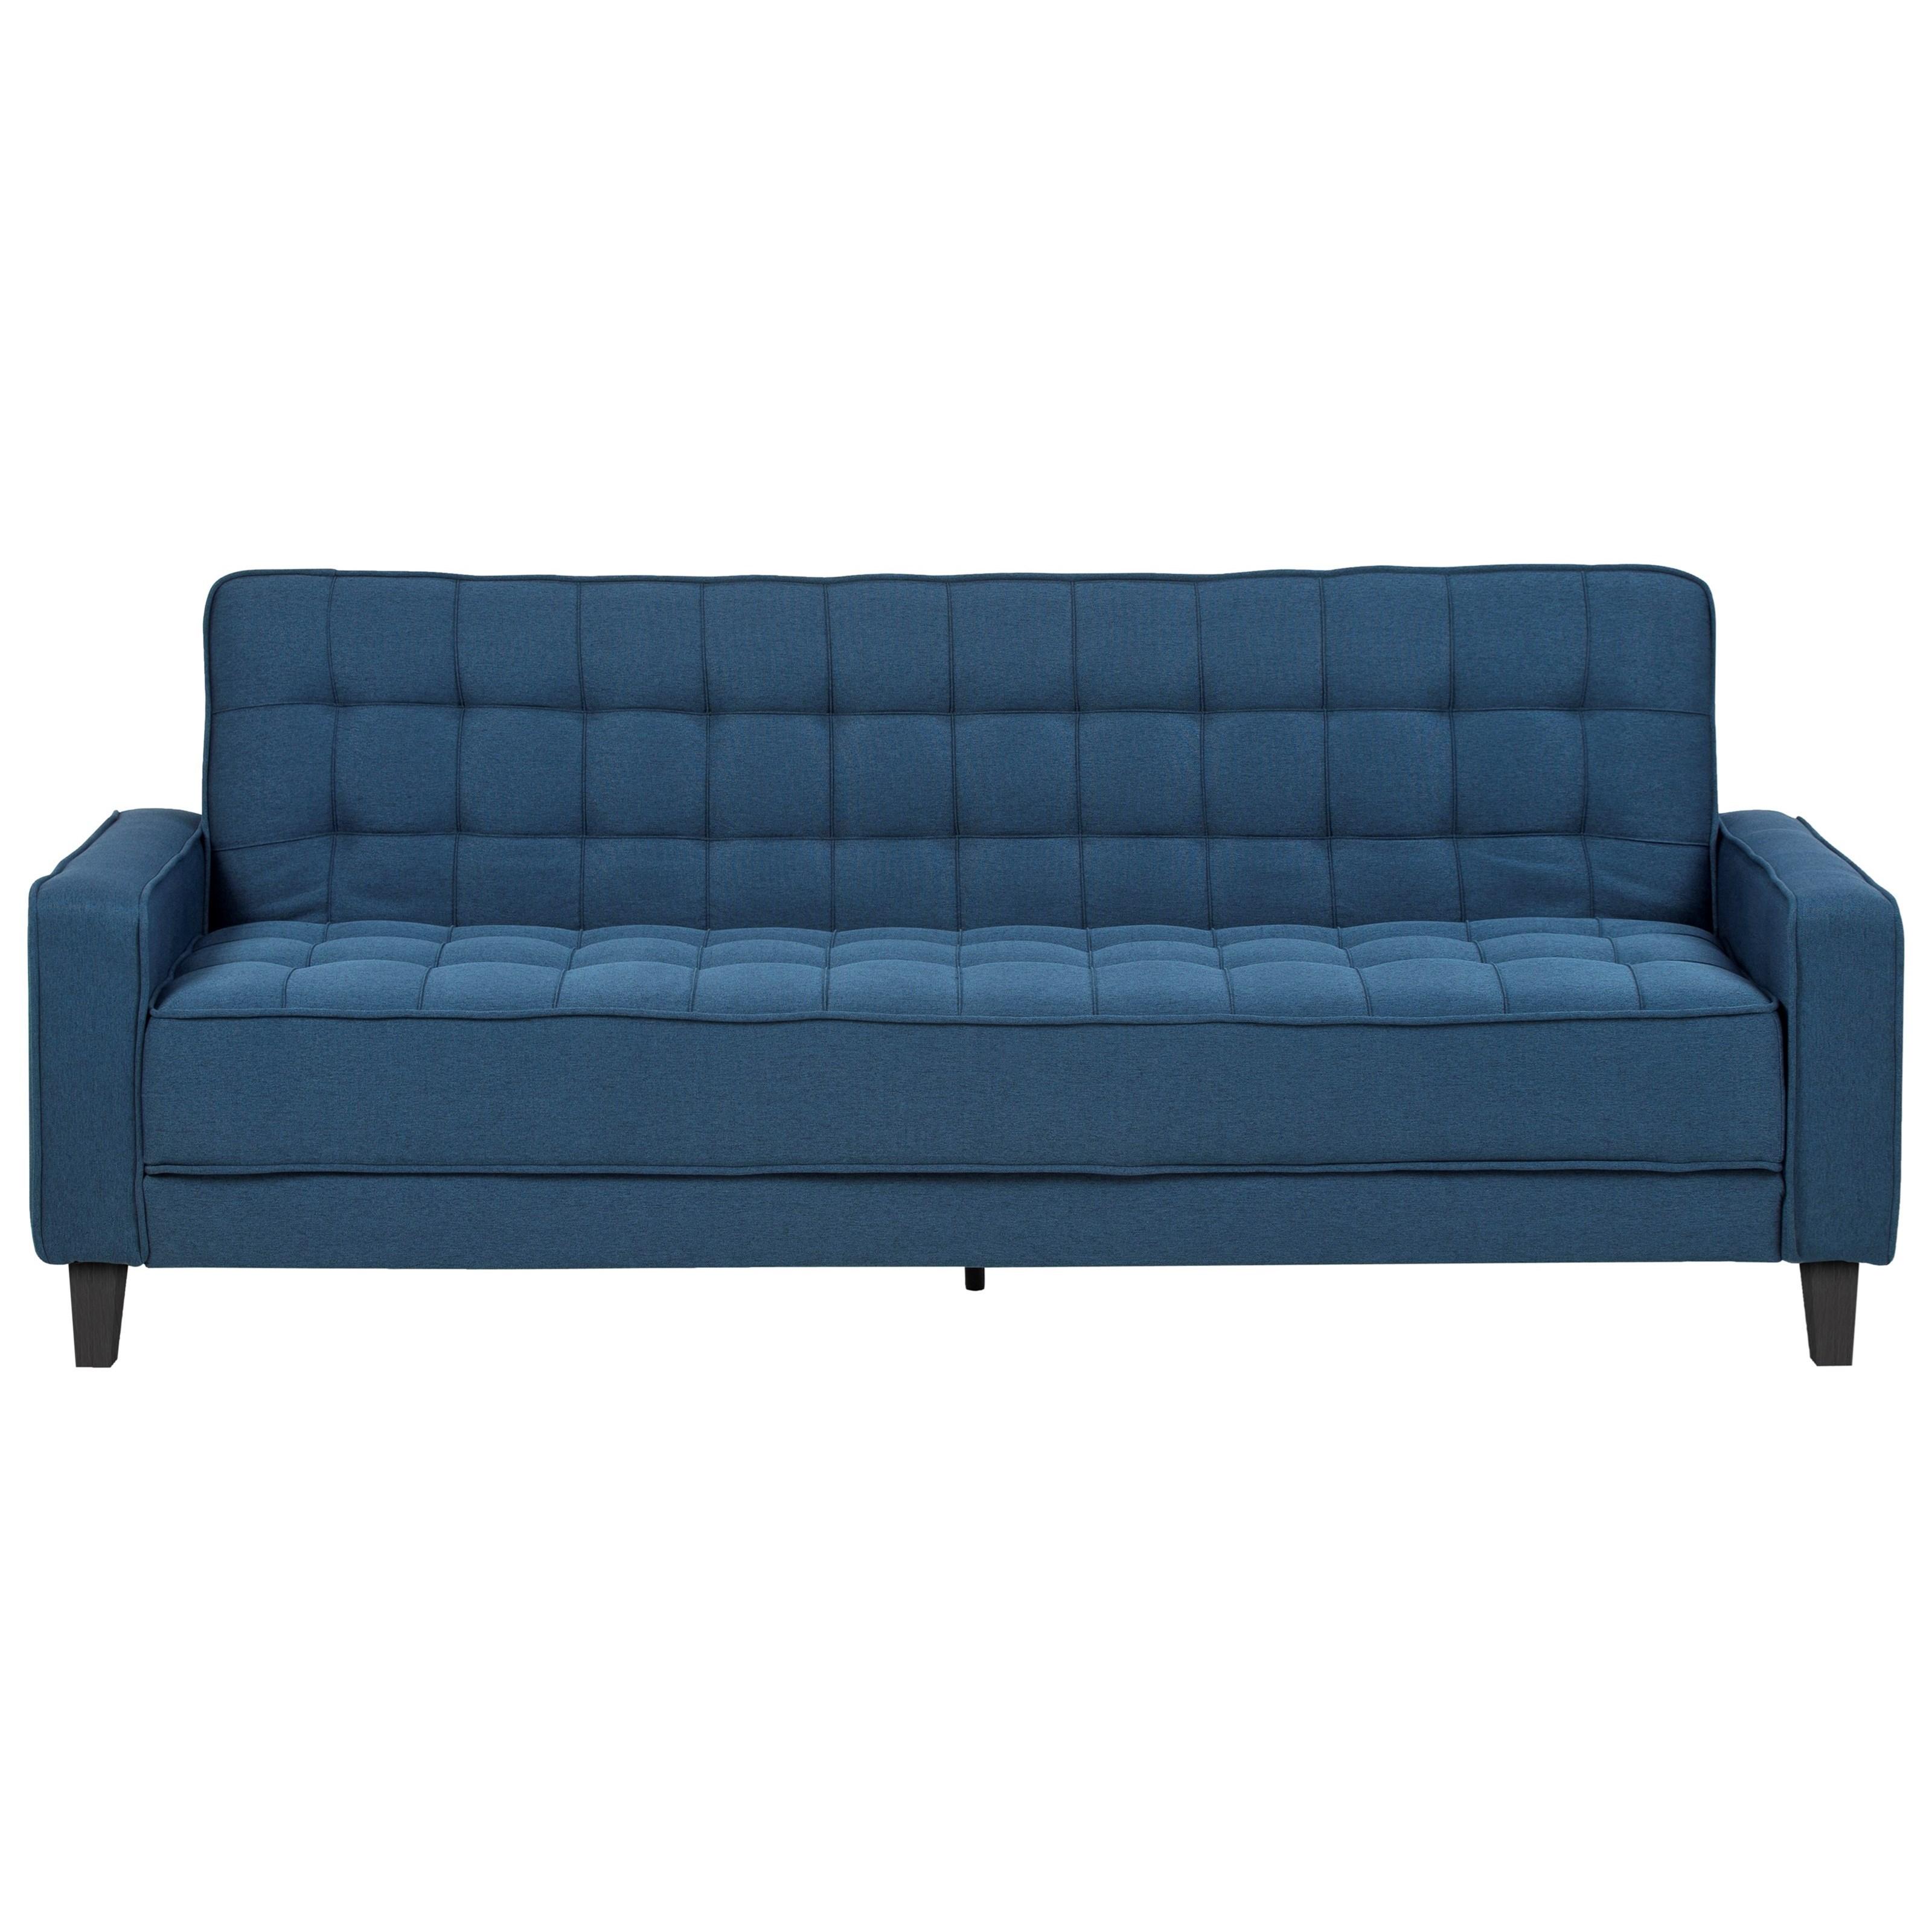 Honolulu futon company for Sectional sofas honolulu